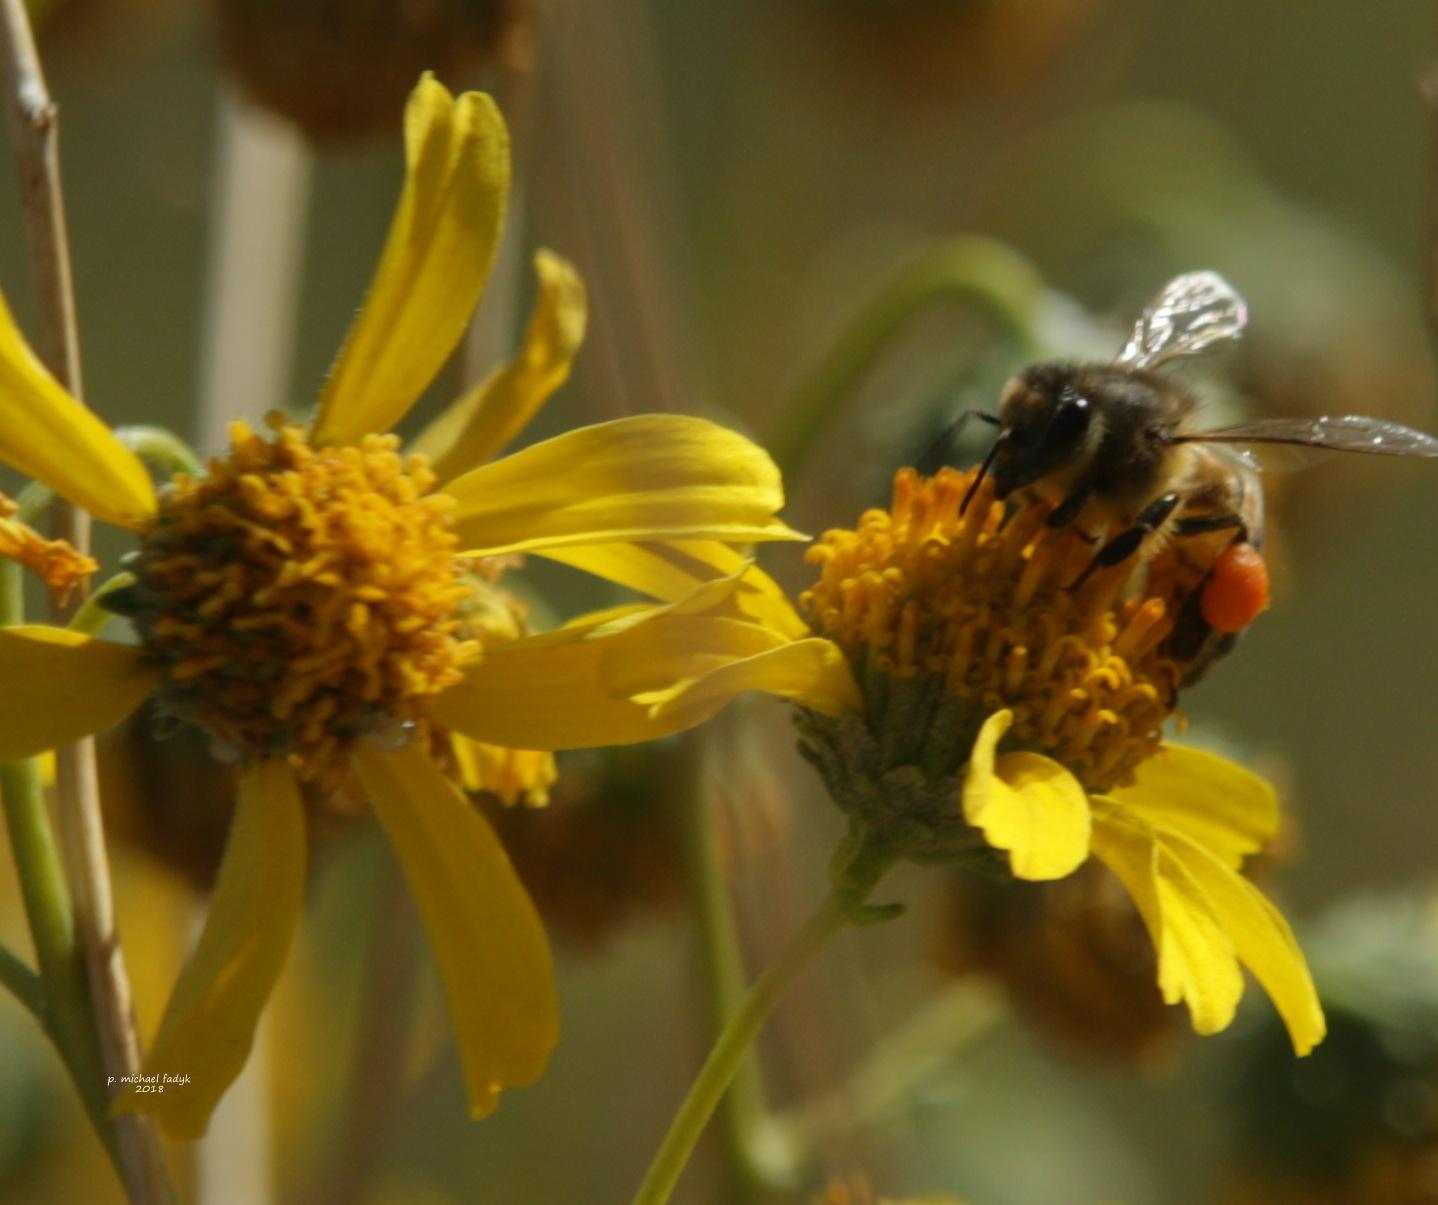 buzz 7 by P. Michael Fadyk